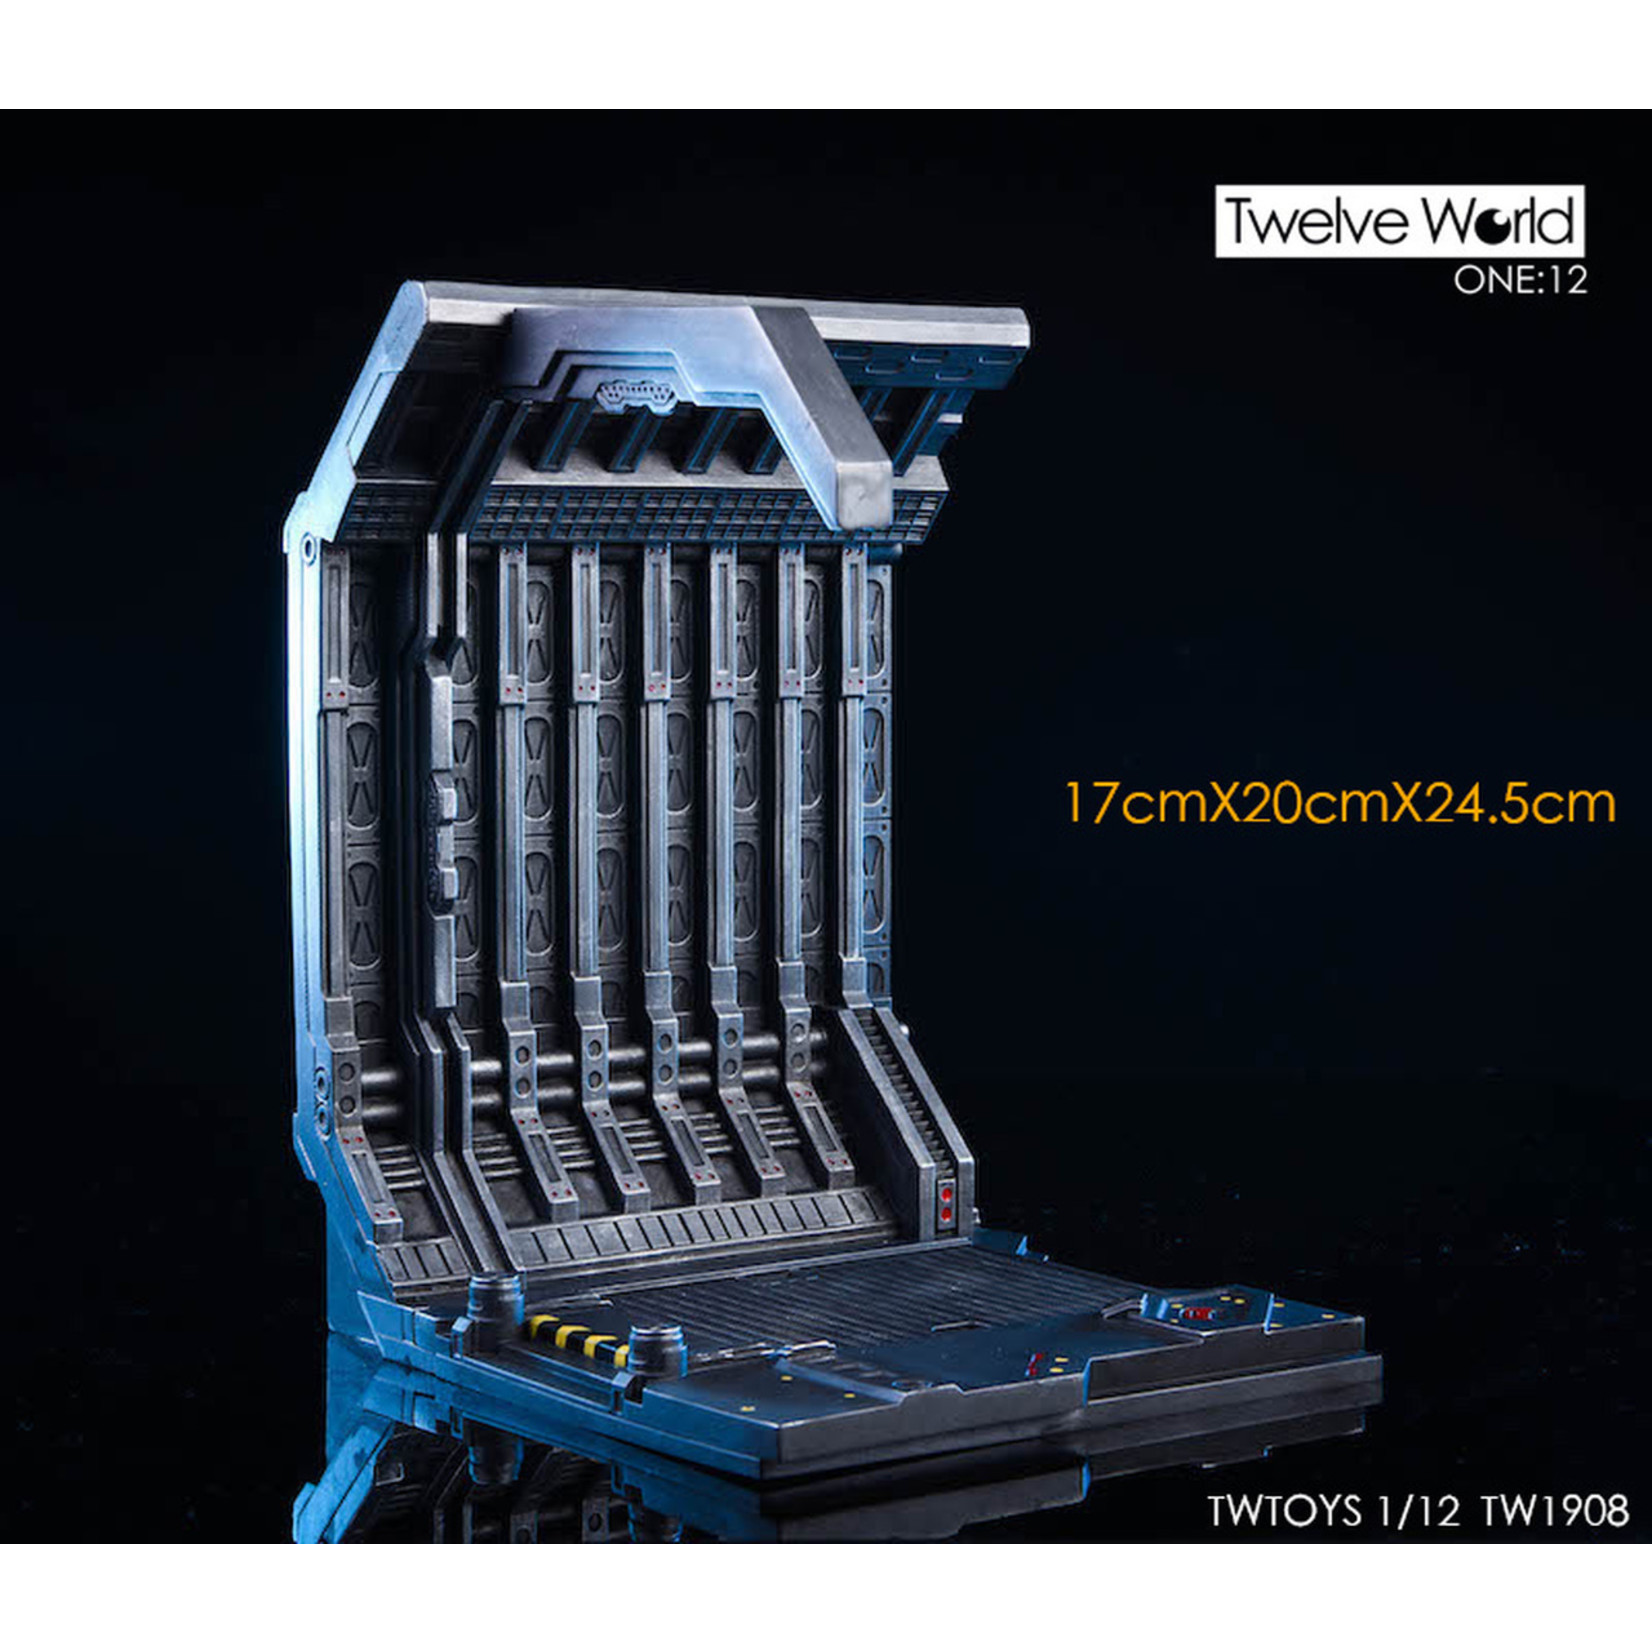 TW Toys EXPANSION SERIES GENNAKU 1/12 SCALE SCIFI PLATFORM